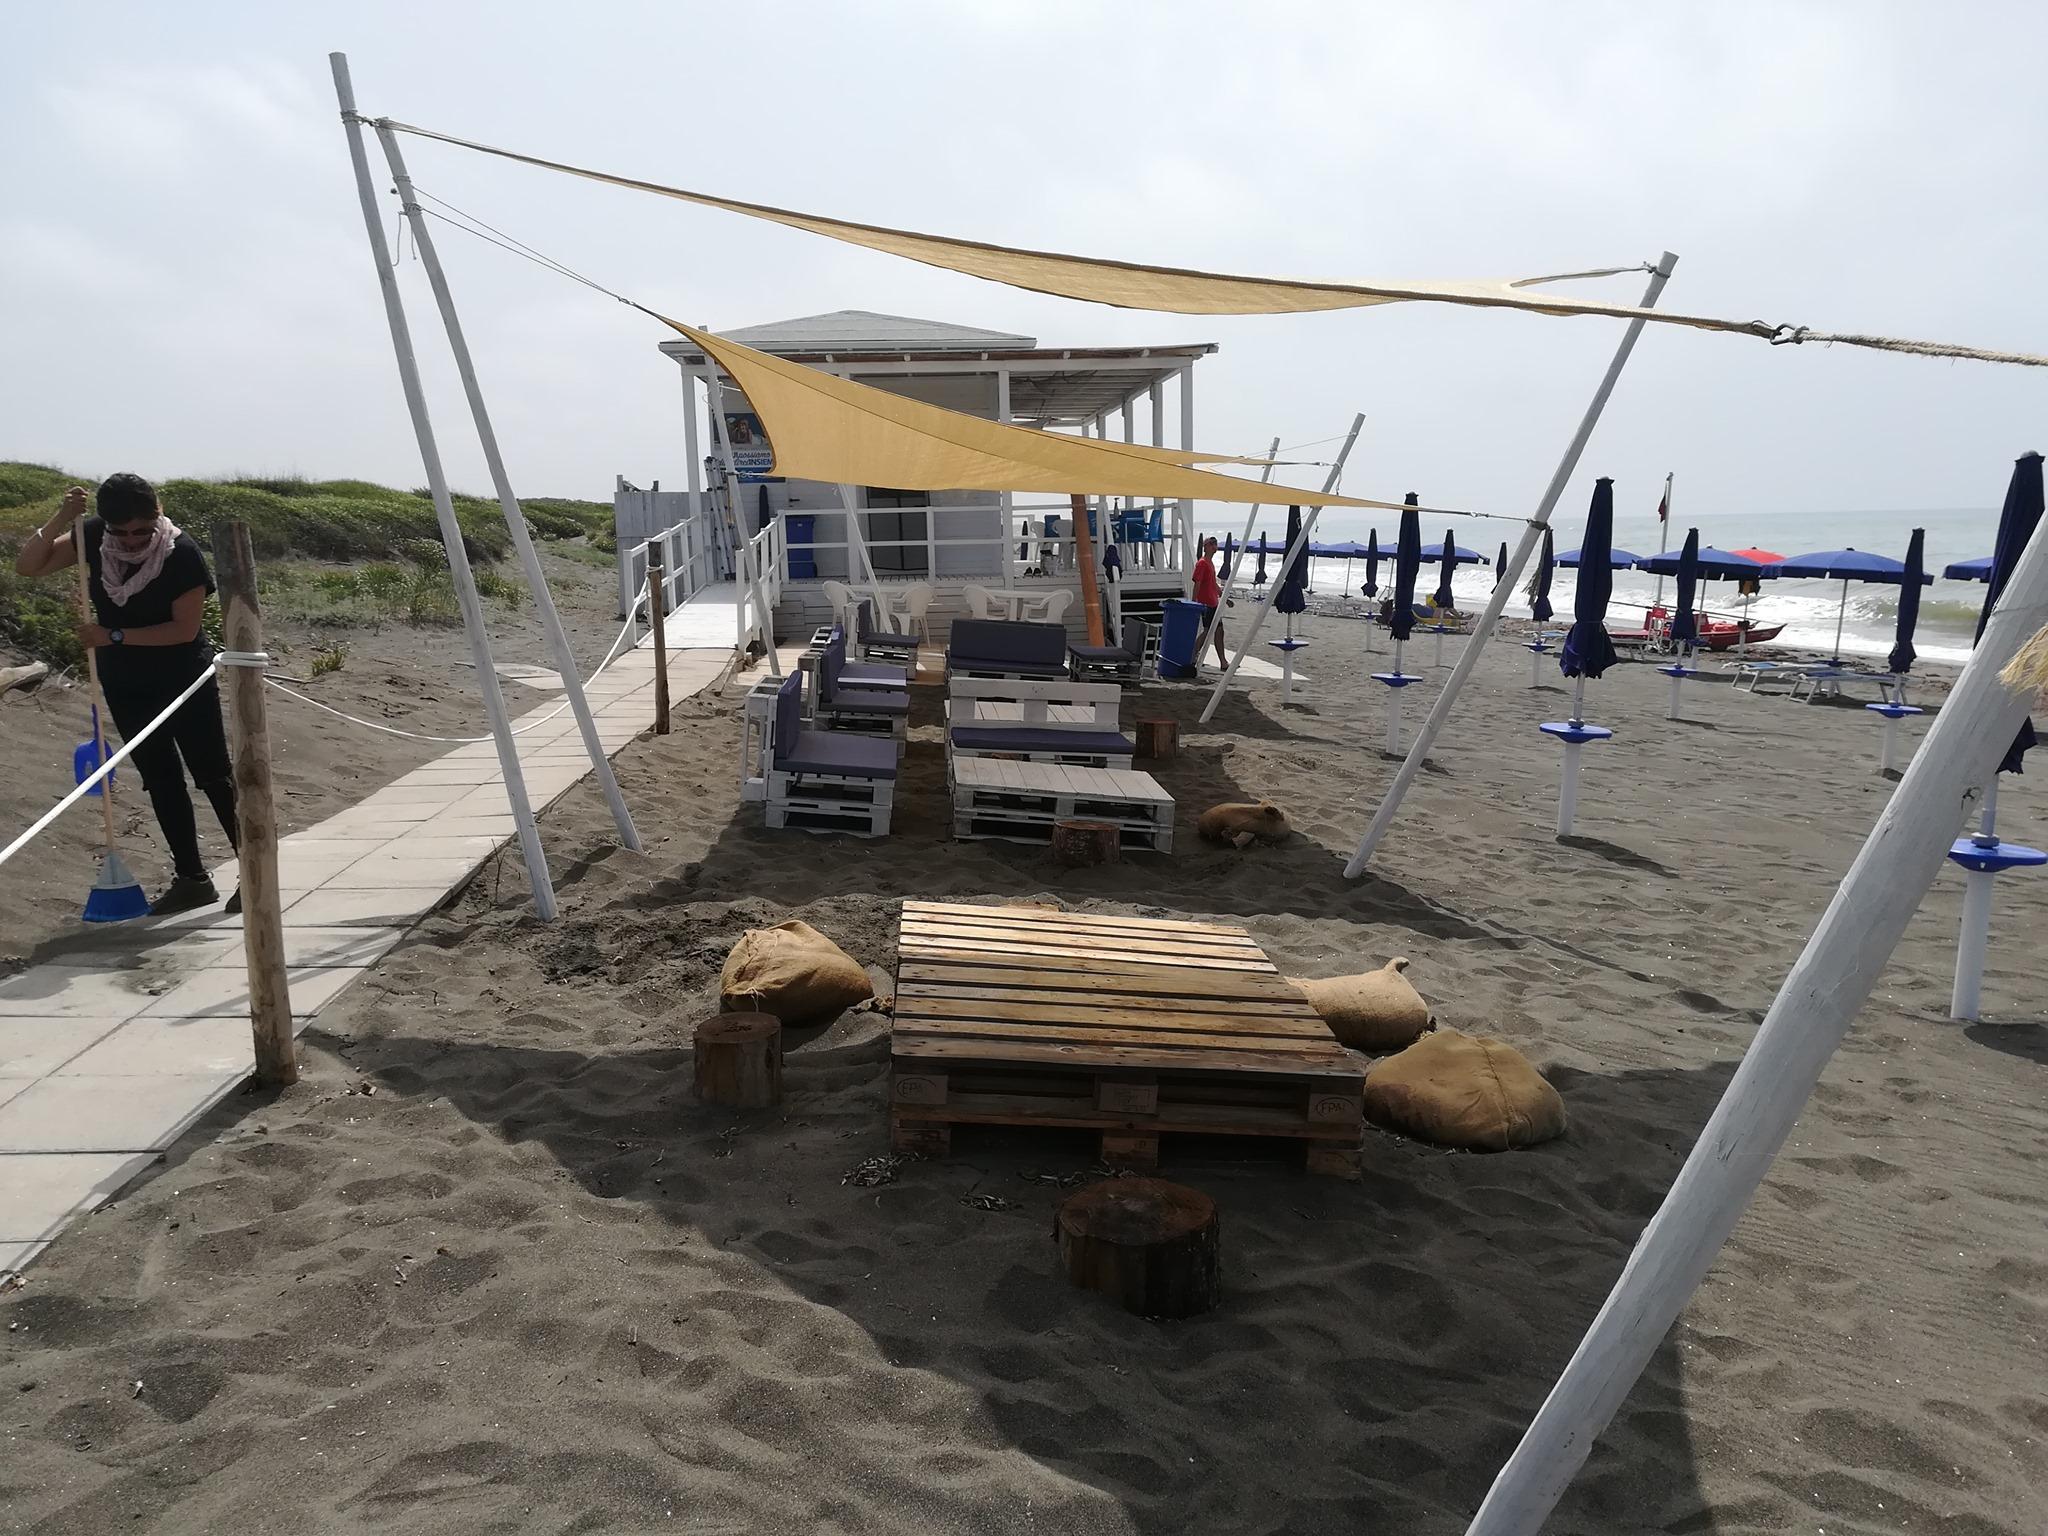 Tequila Dog Beach